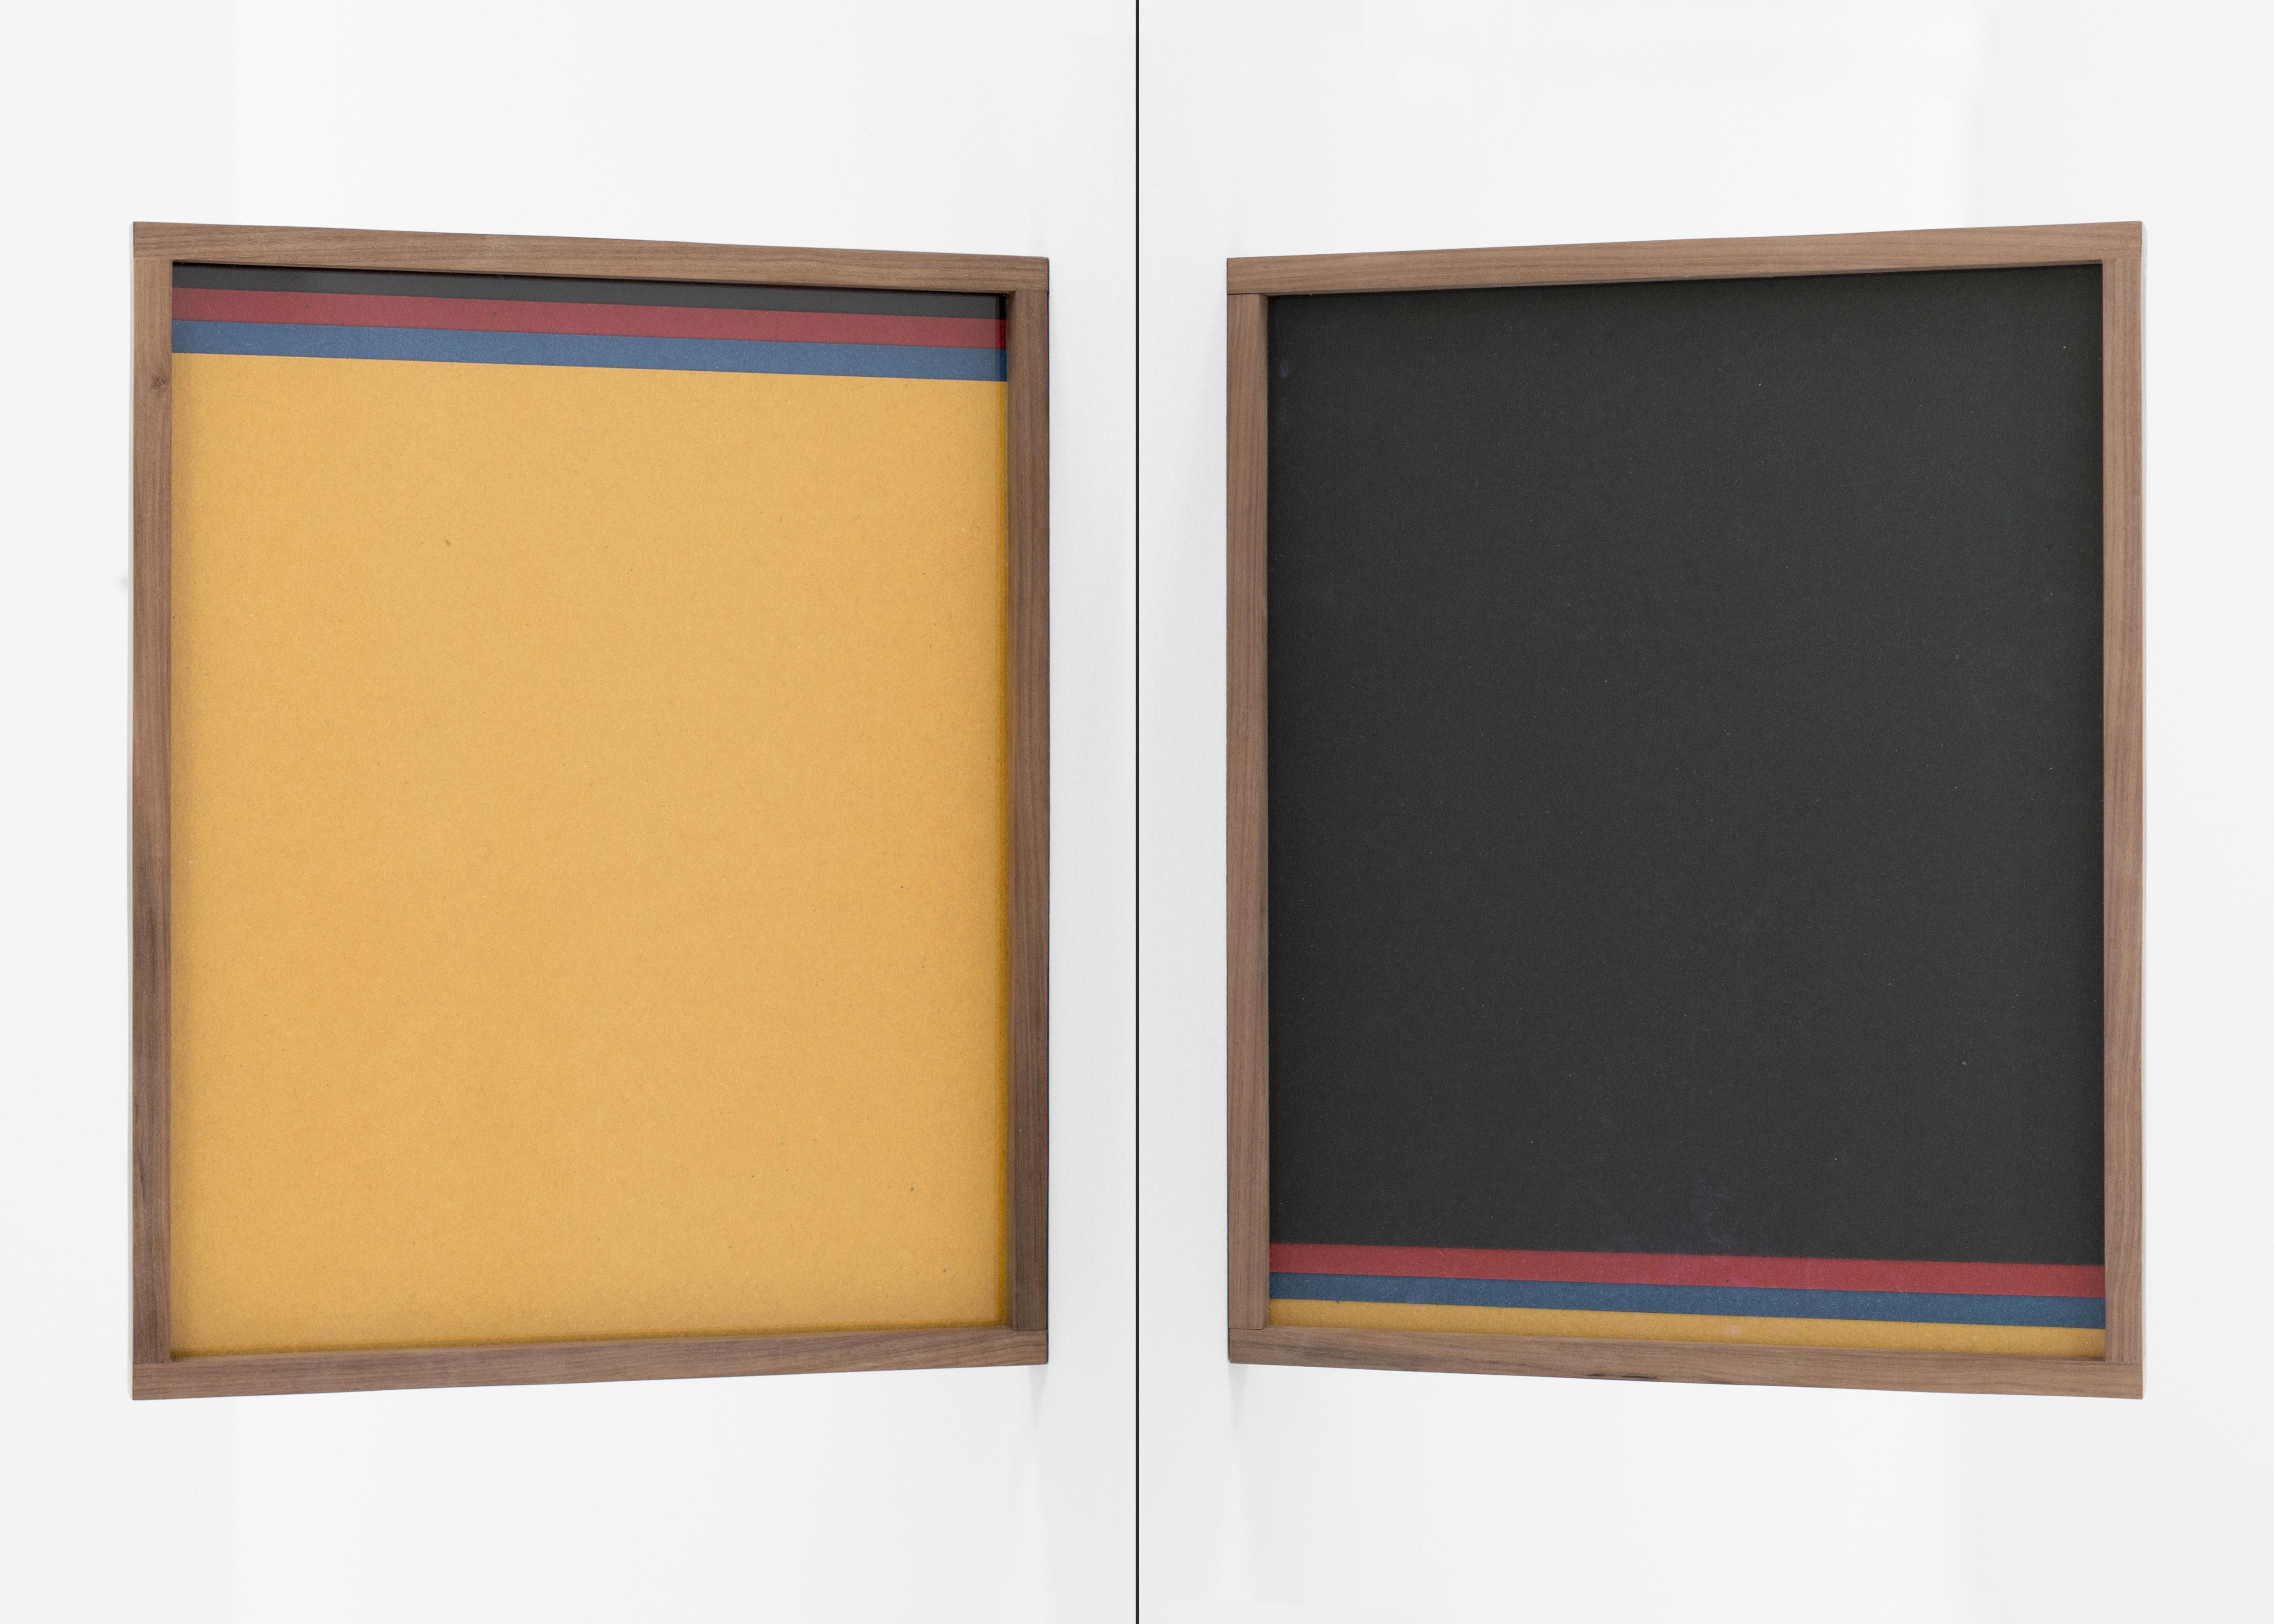 RMA ÁLVAREZ LAVIADA S.T (Muestrario 1), 2021, Irma Álvarez-Laviada: TODO SE PARECE A ALGO , L21, 14 May – 23 June. Courtesy: L21 Gallery